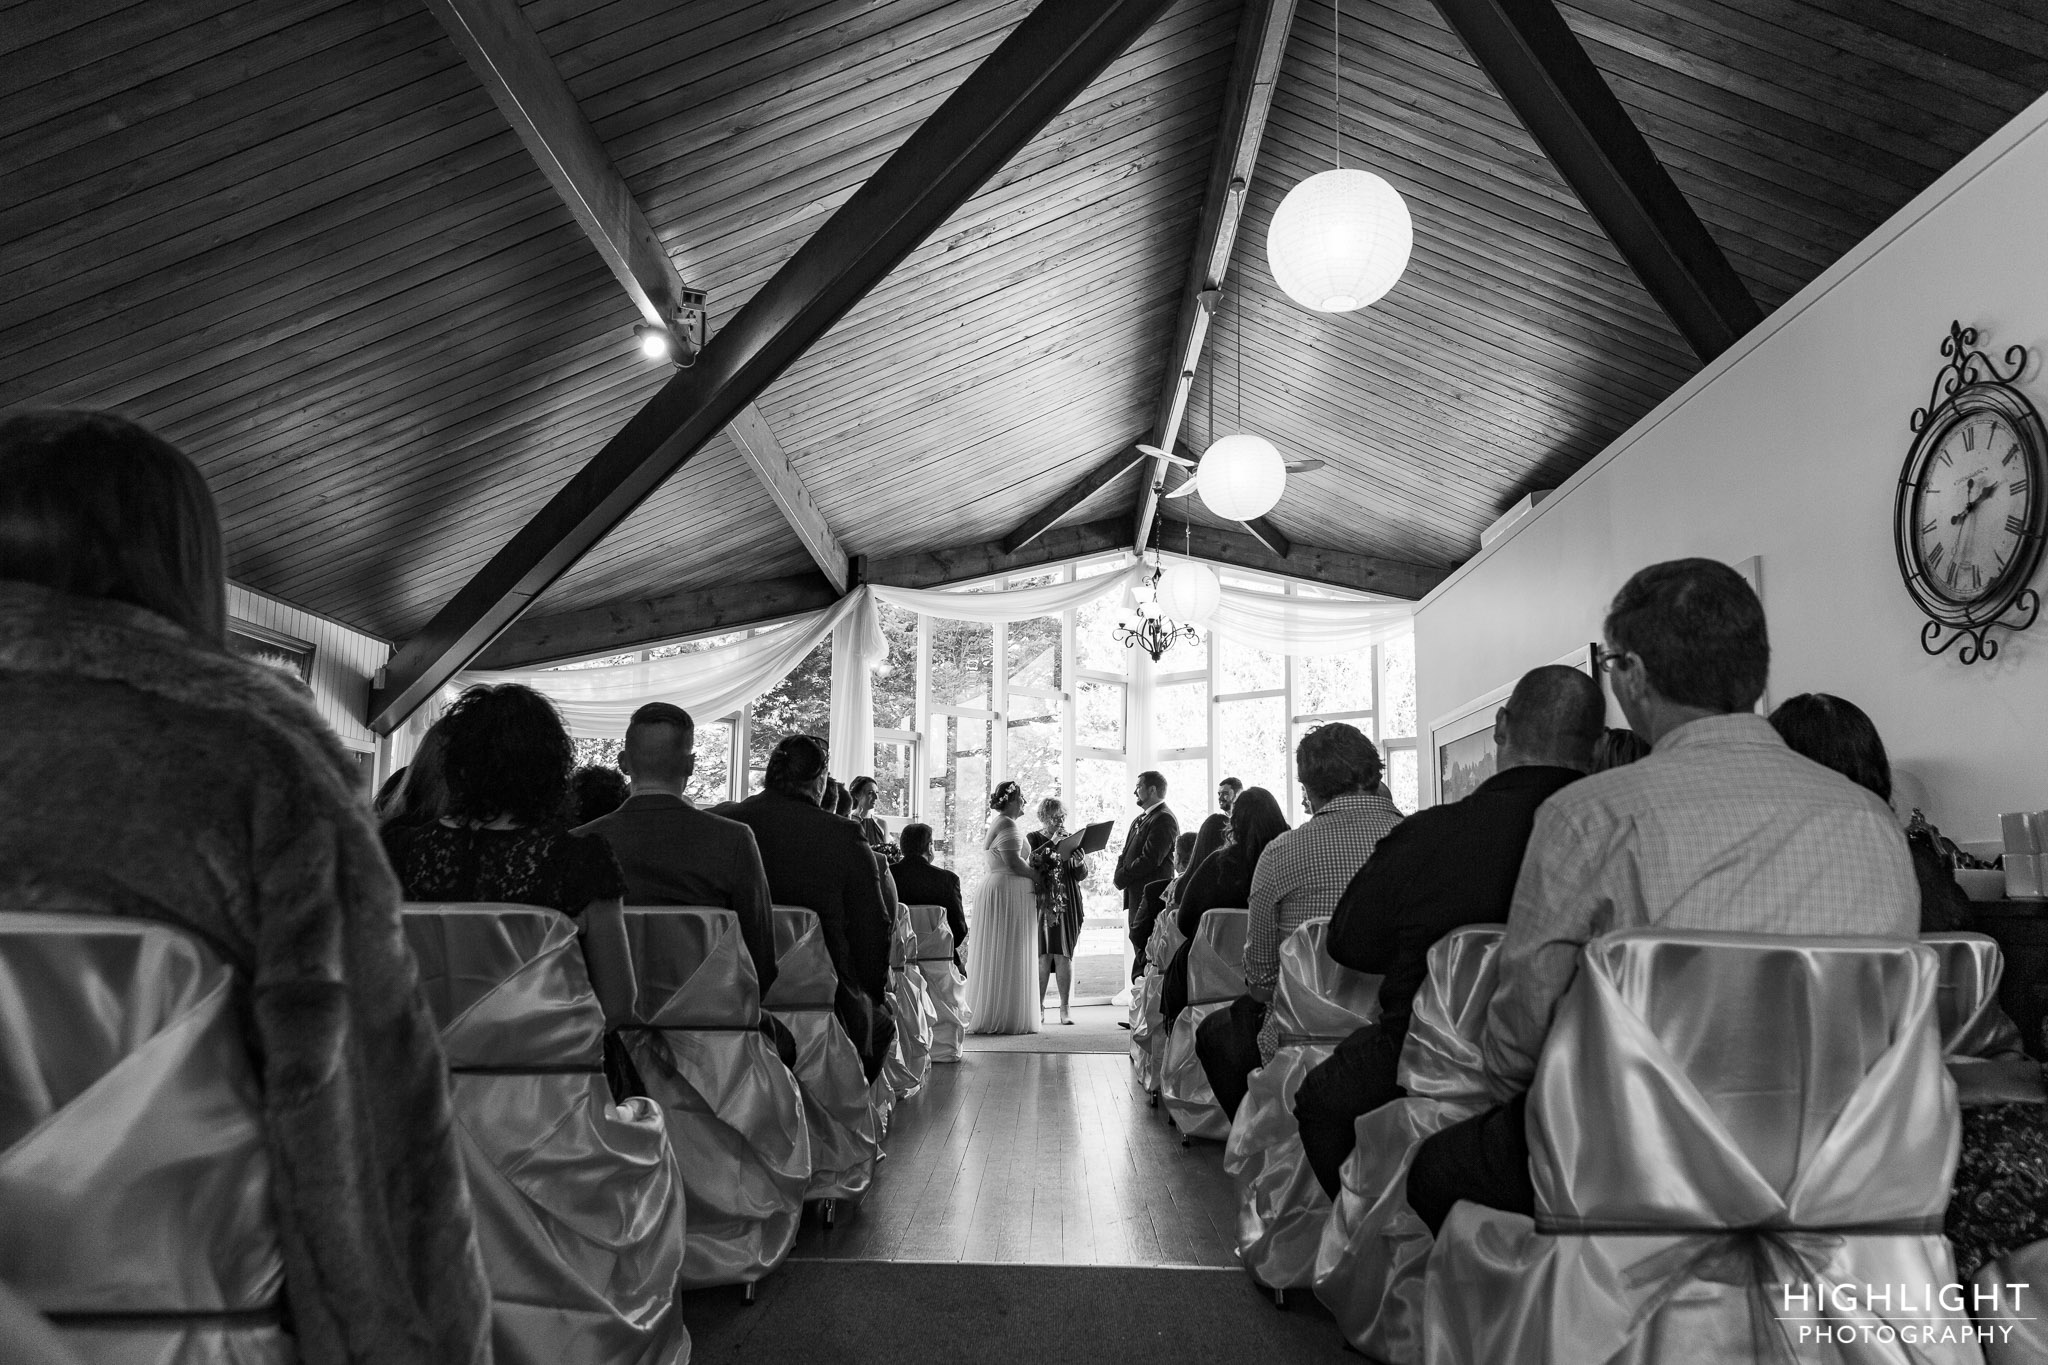 Highlight-wedding-photography-new-zealand-palmerston-north-50.jpg